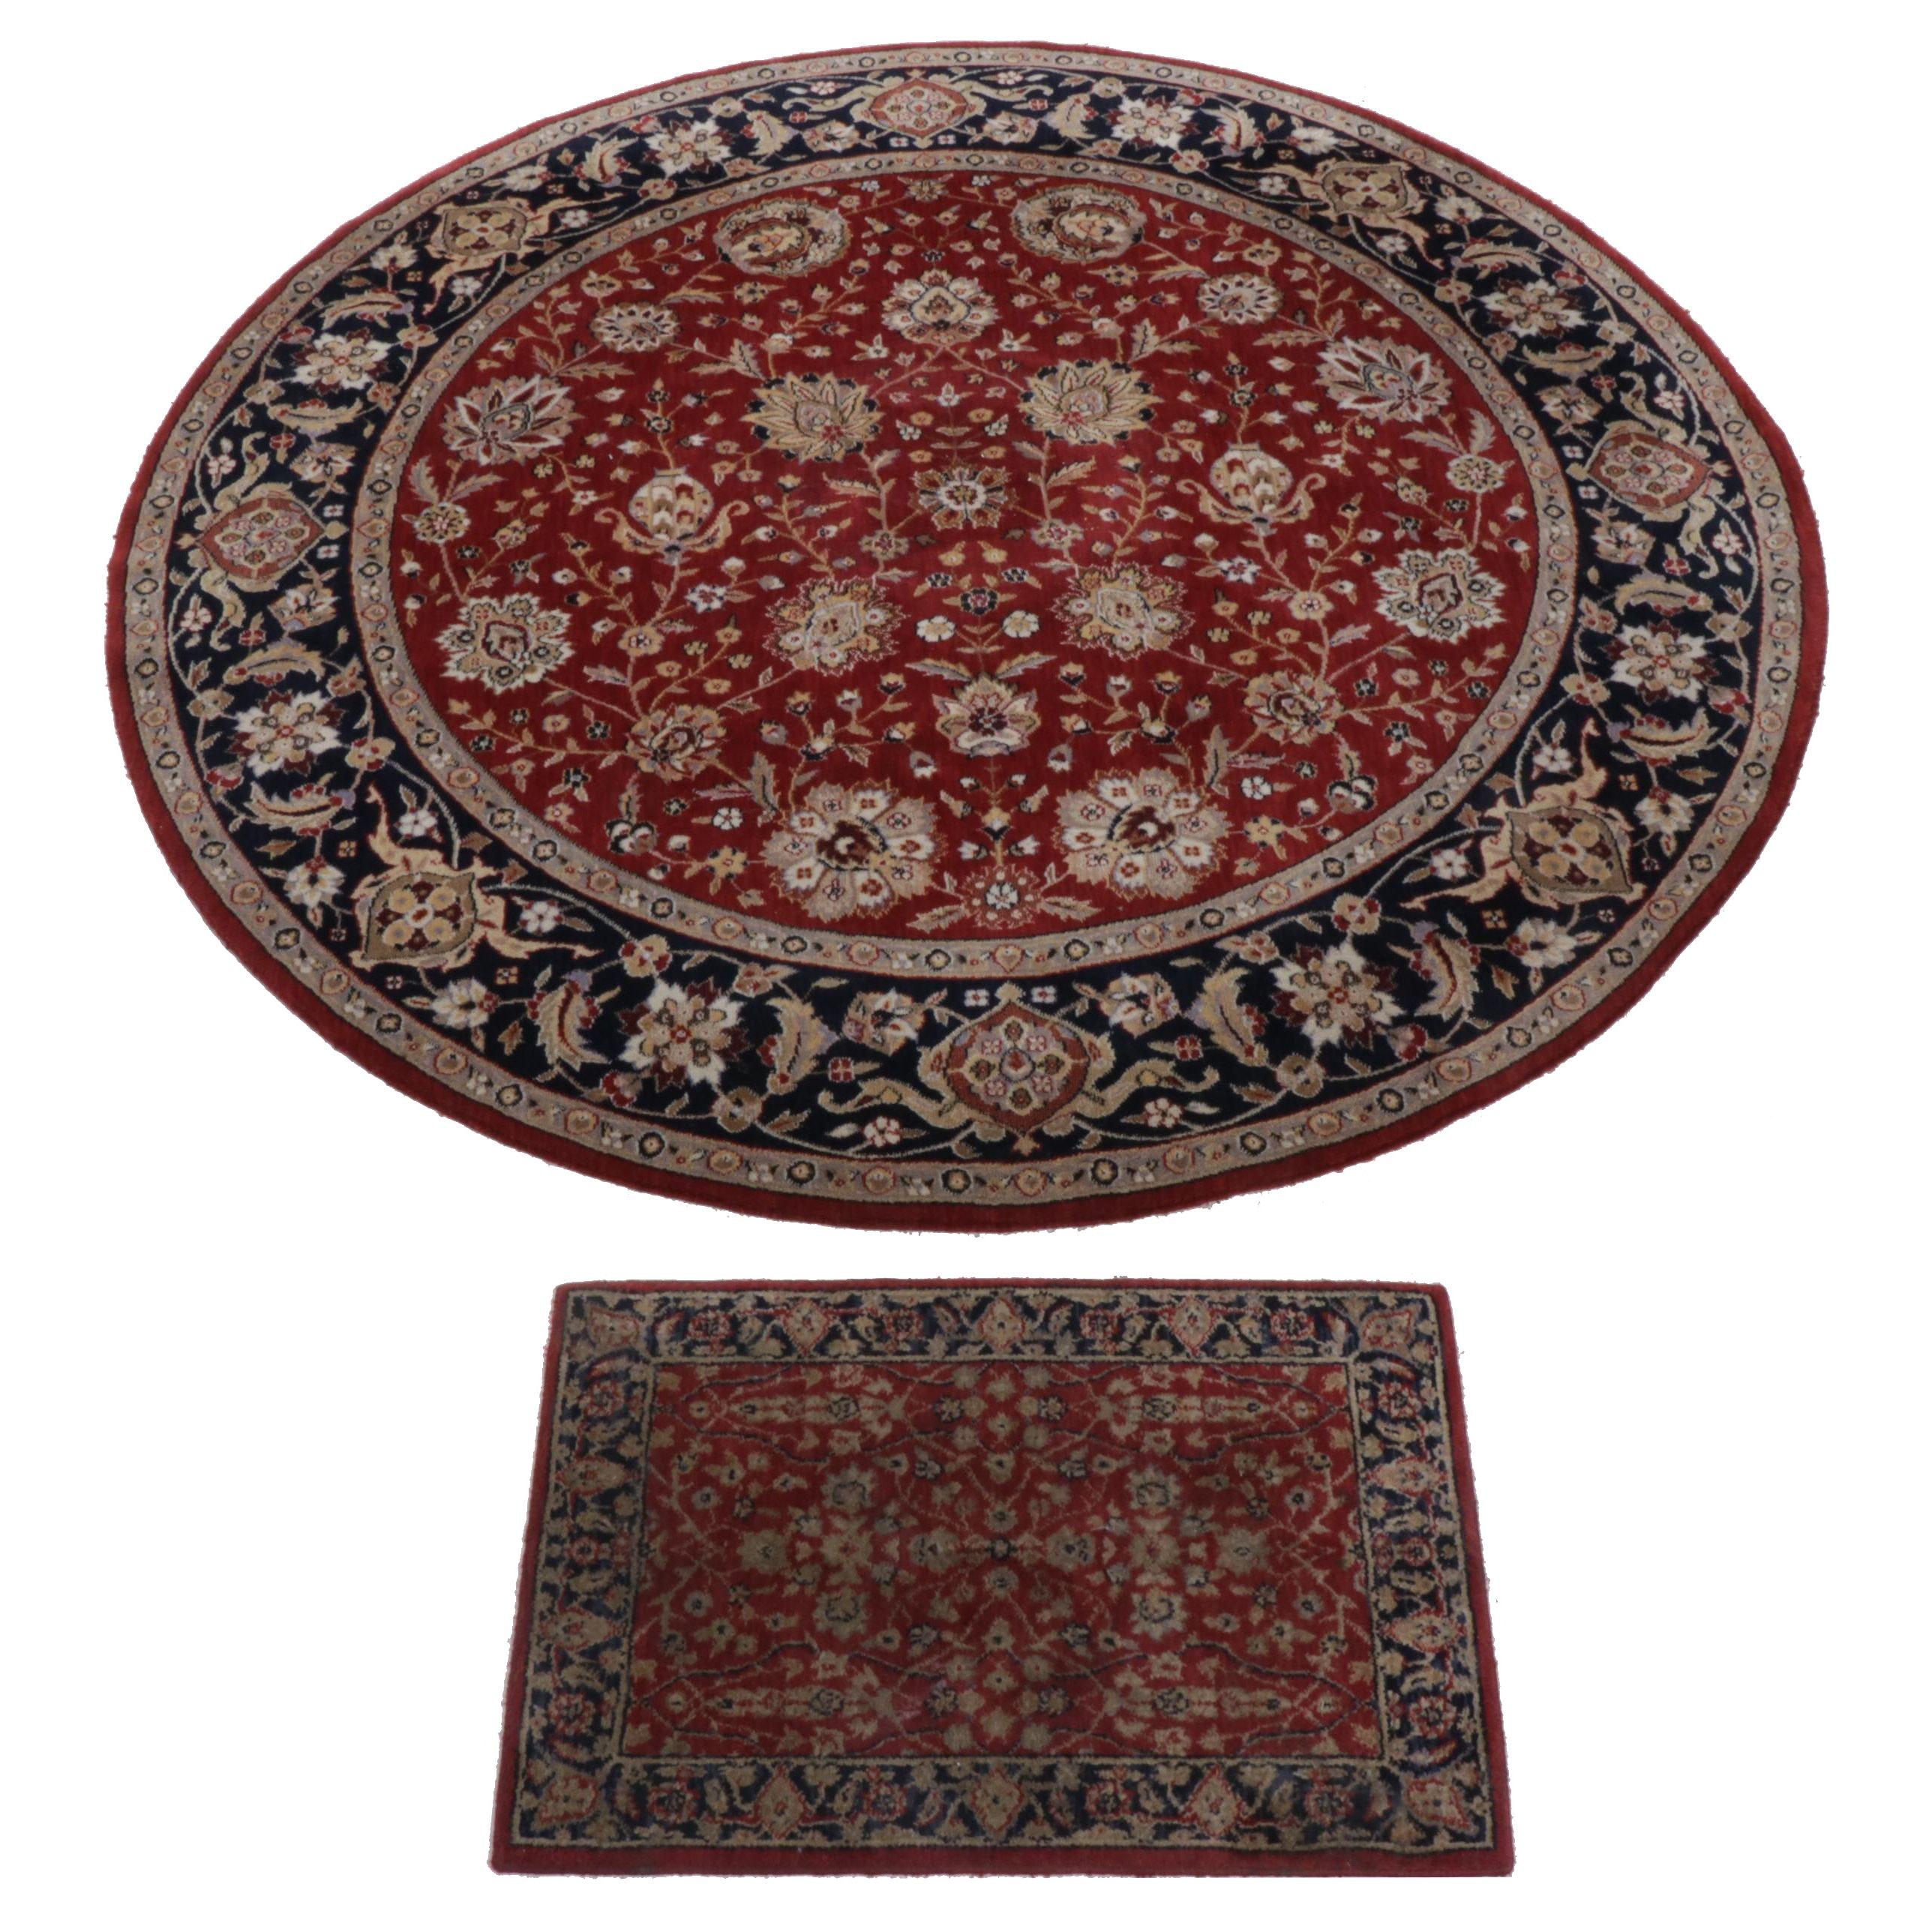 Machine Made Persian Style Rugs